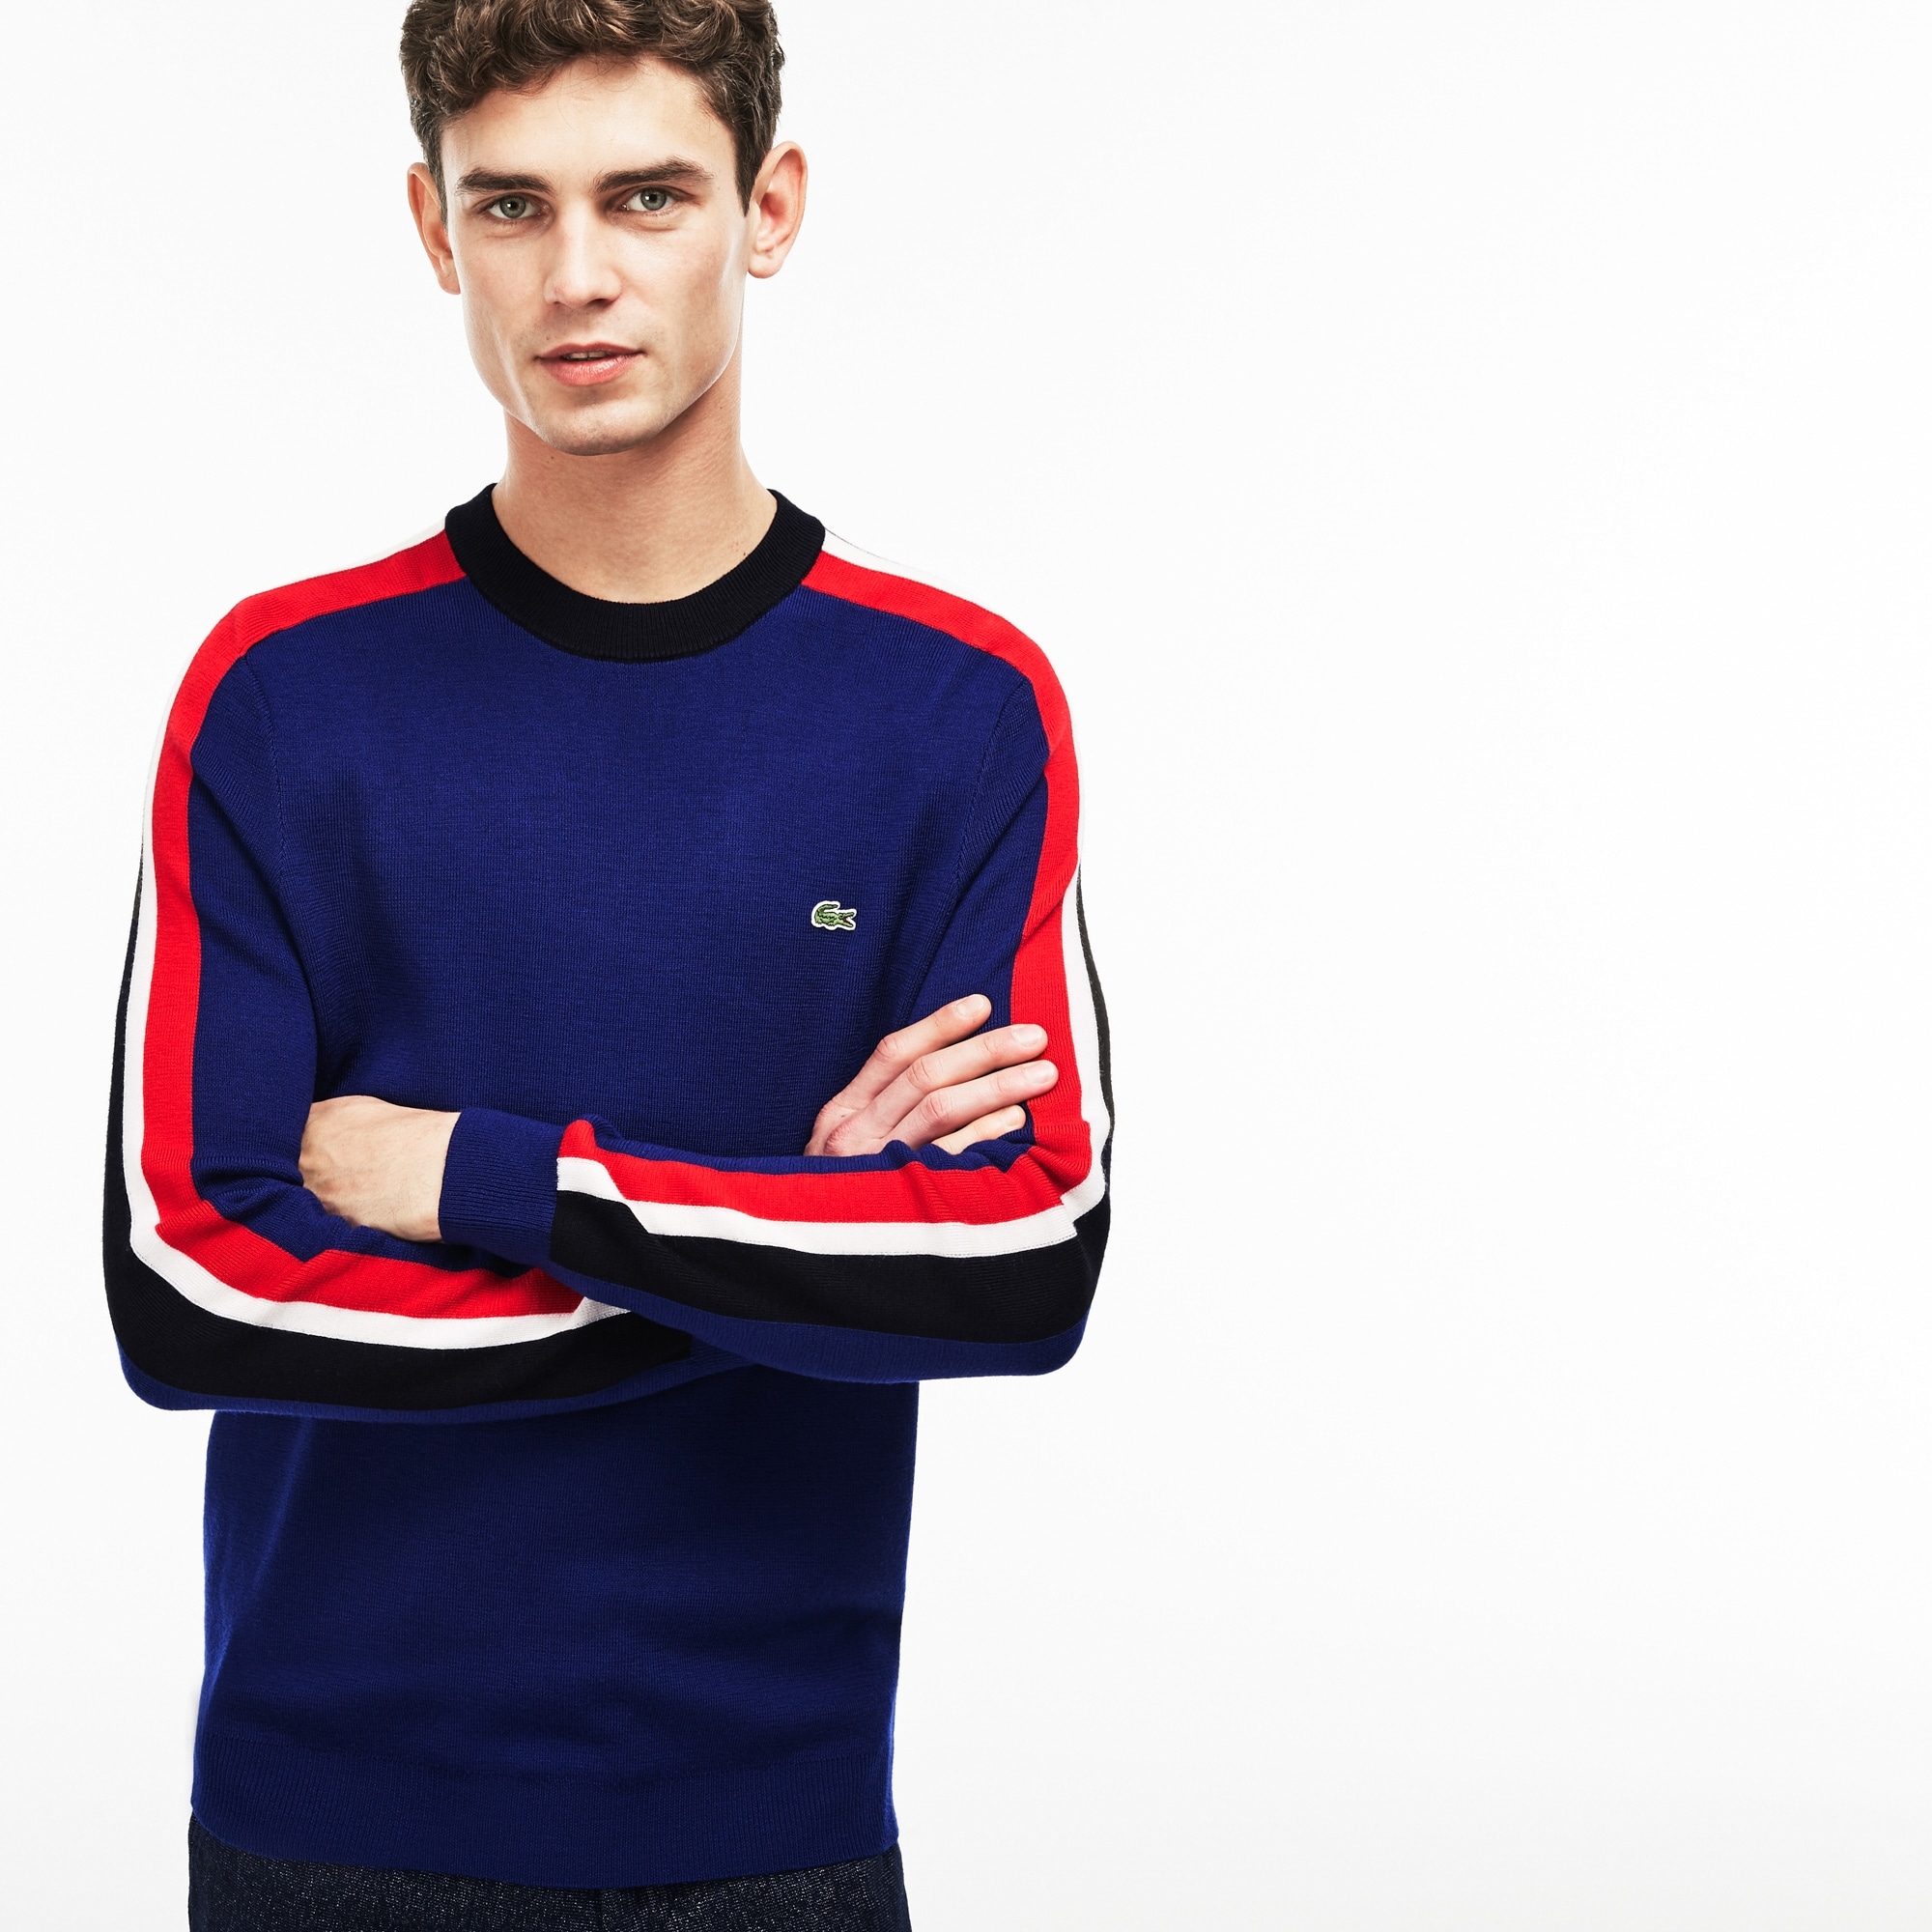 Men's Crew Neck Ribbed Wool Colorblock Stripe Sweater